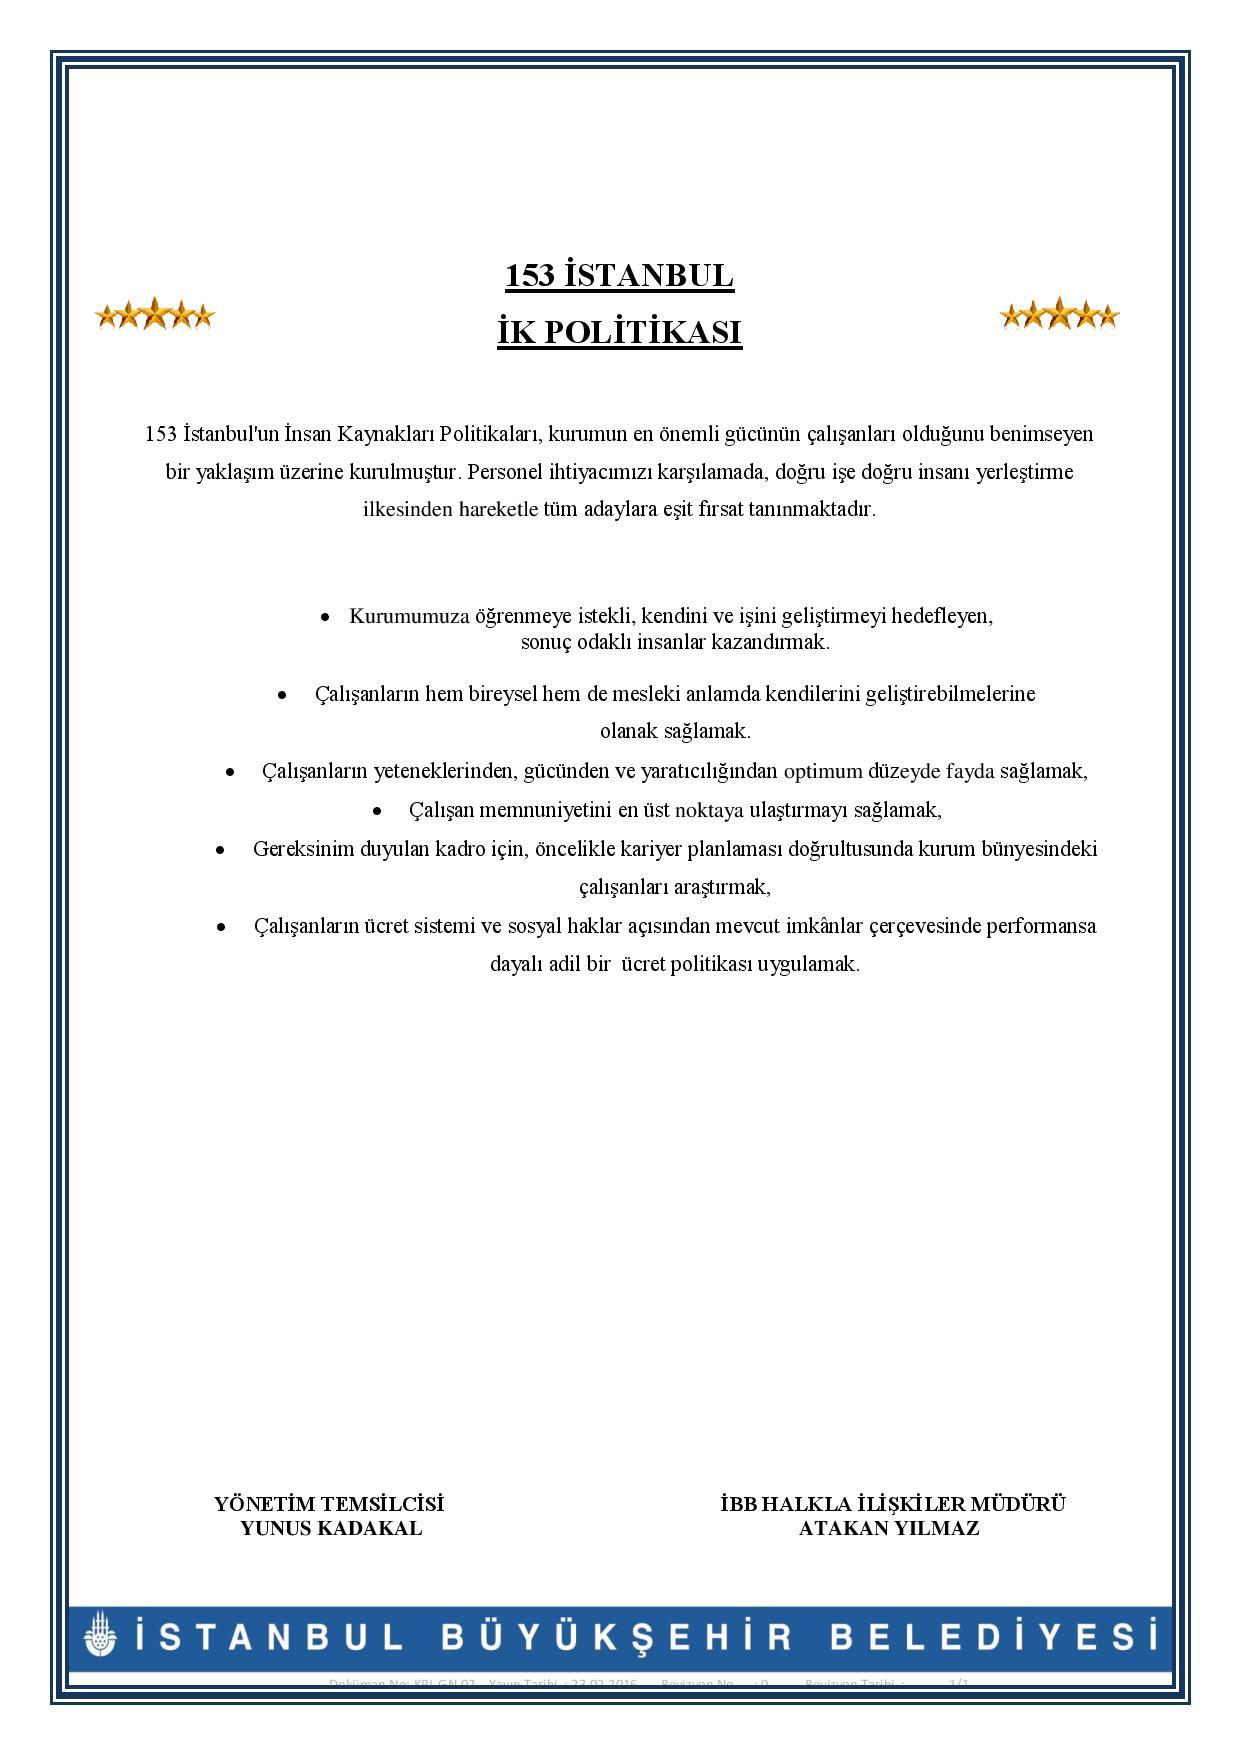 KPL.GN.002. İK Politikası 29.04.16 Page 001